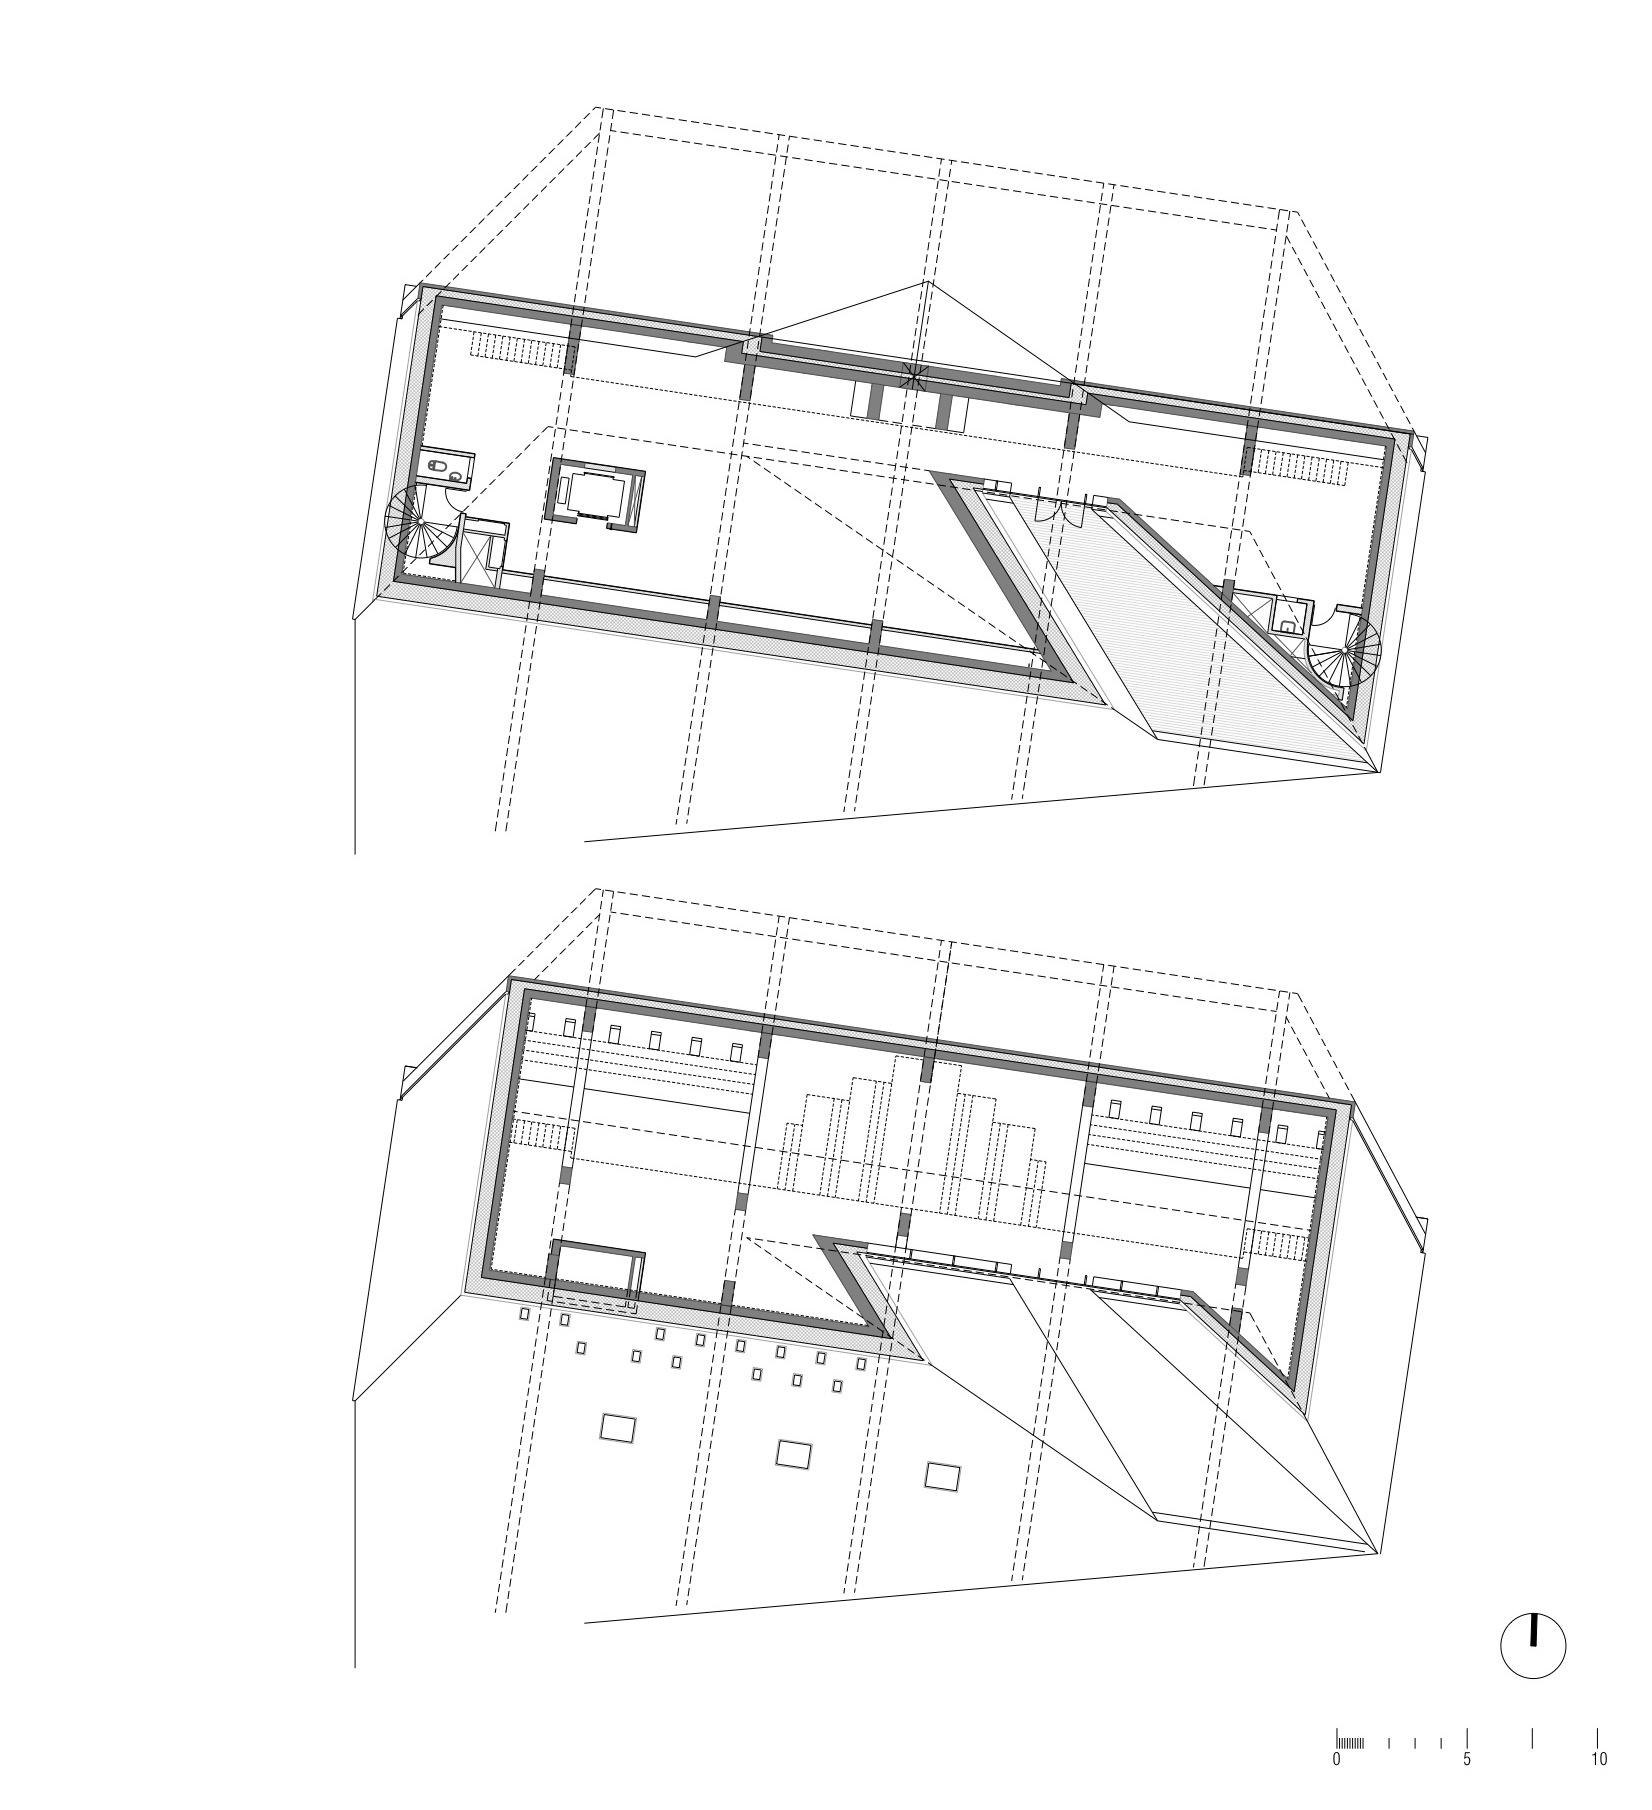 http://ad009cdnb.archdaily.net/wp-content/uploads/2013/08/52099b9de8e44e420d00003b_narva-college-kavakava-architects_level_03_plan.png